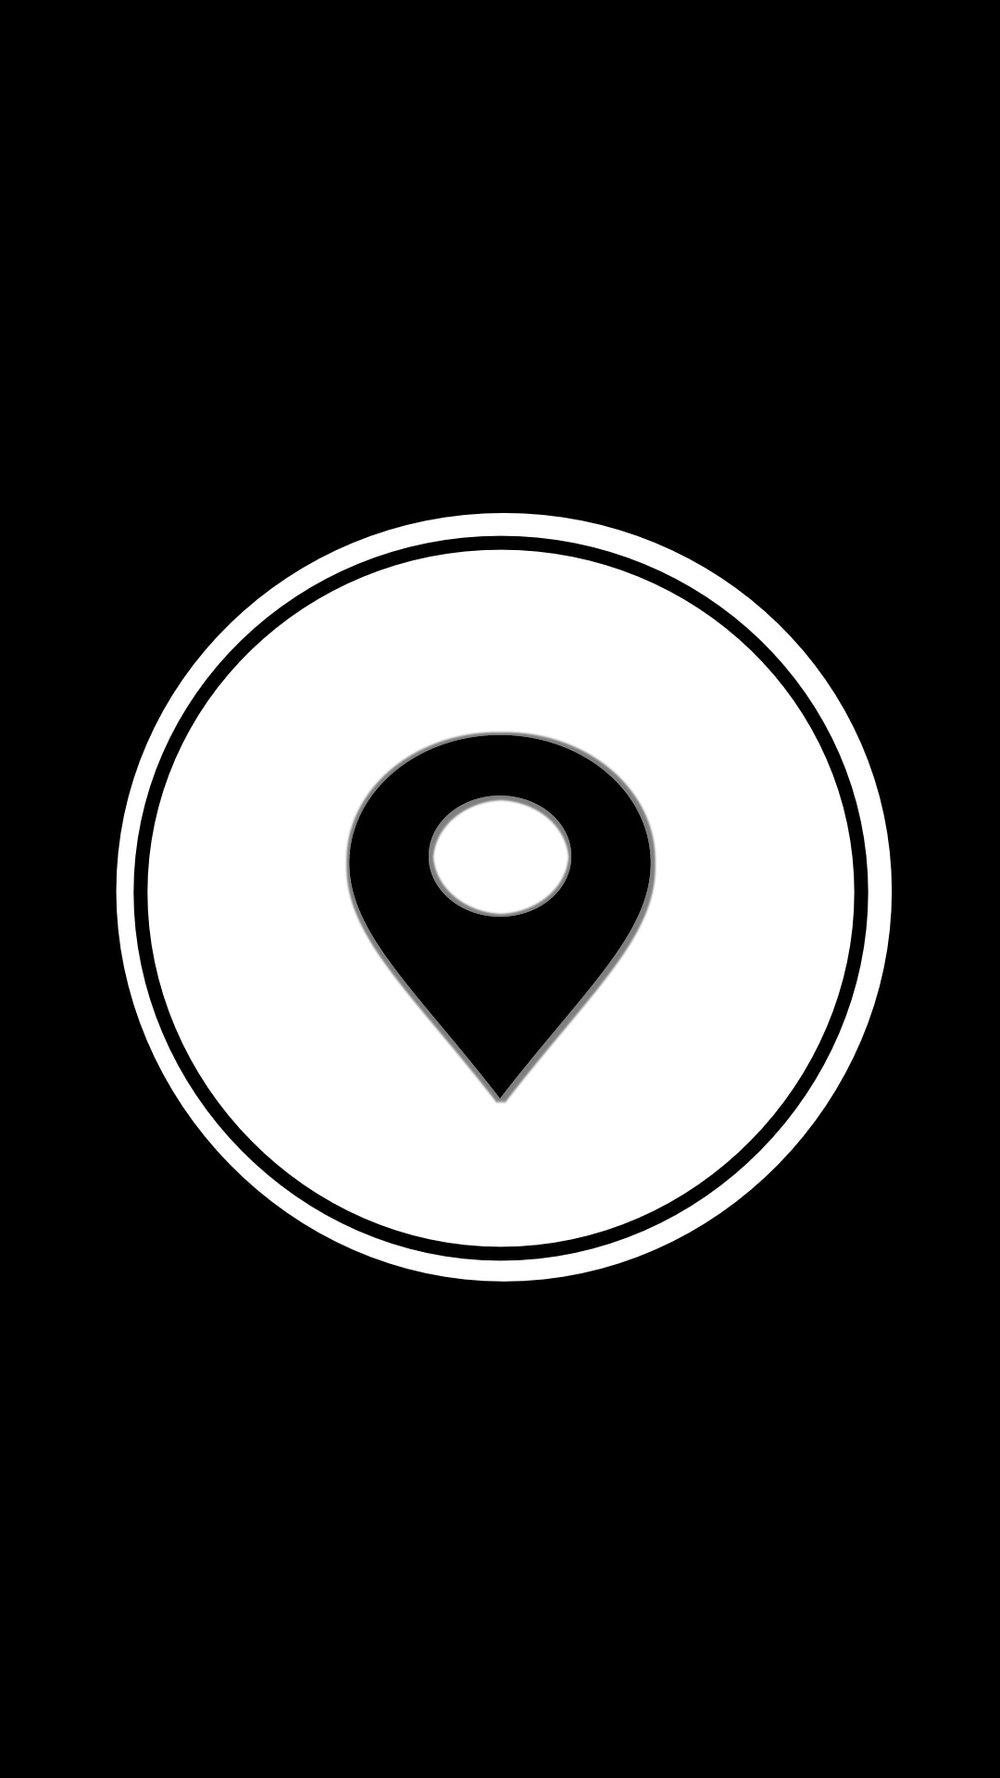 Instagram-cover-locations-black.jpg